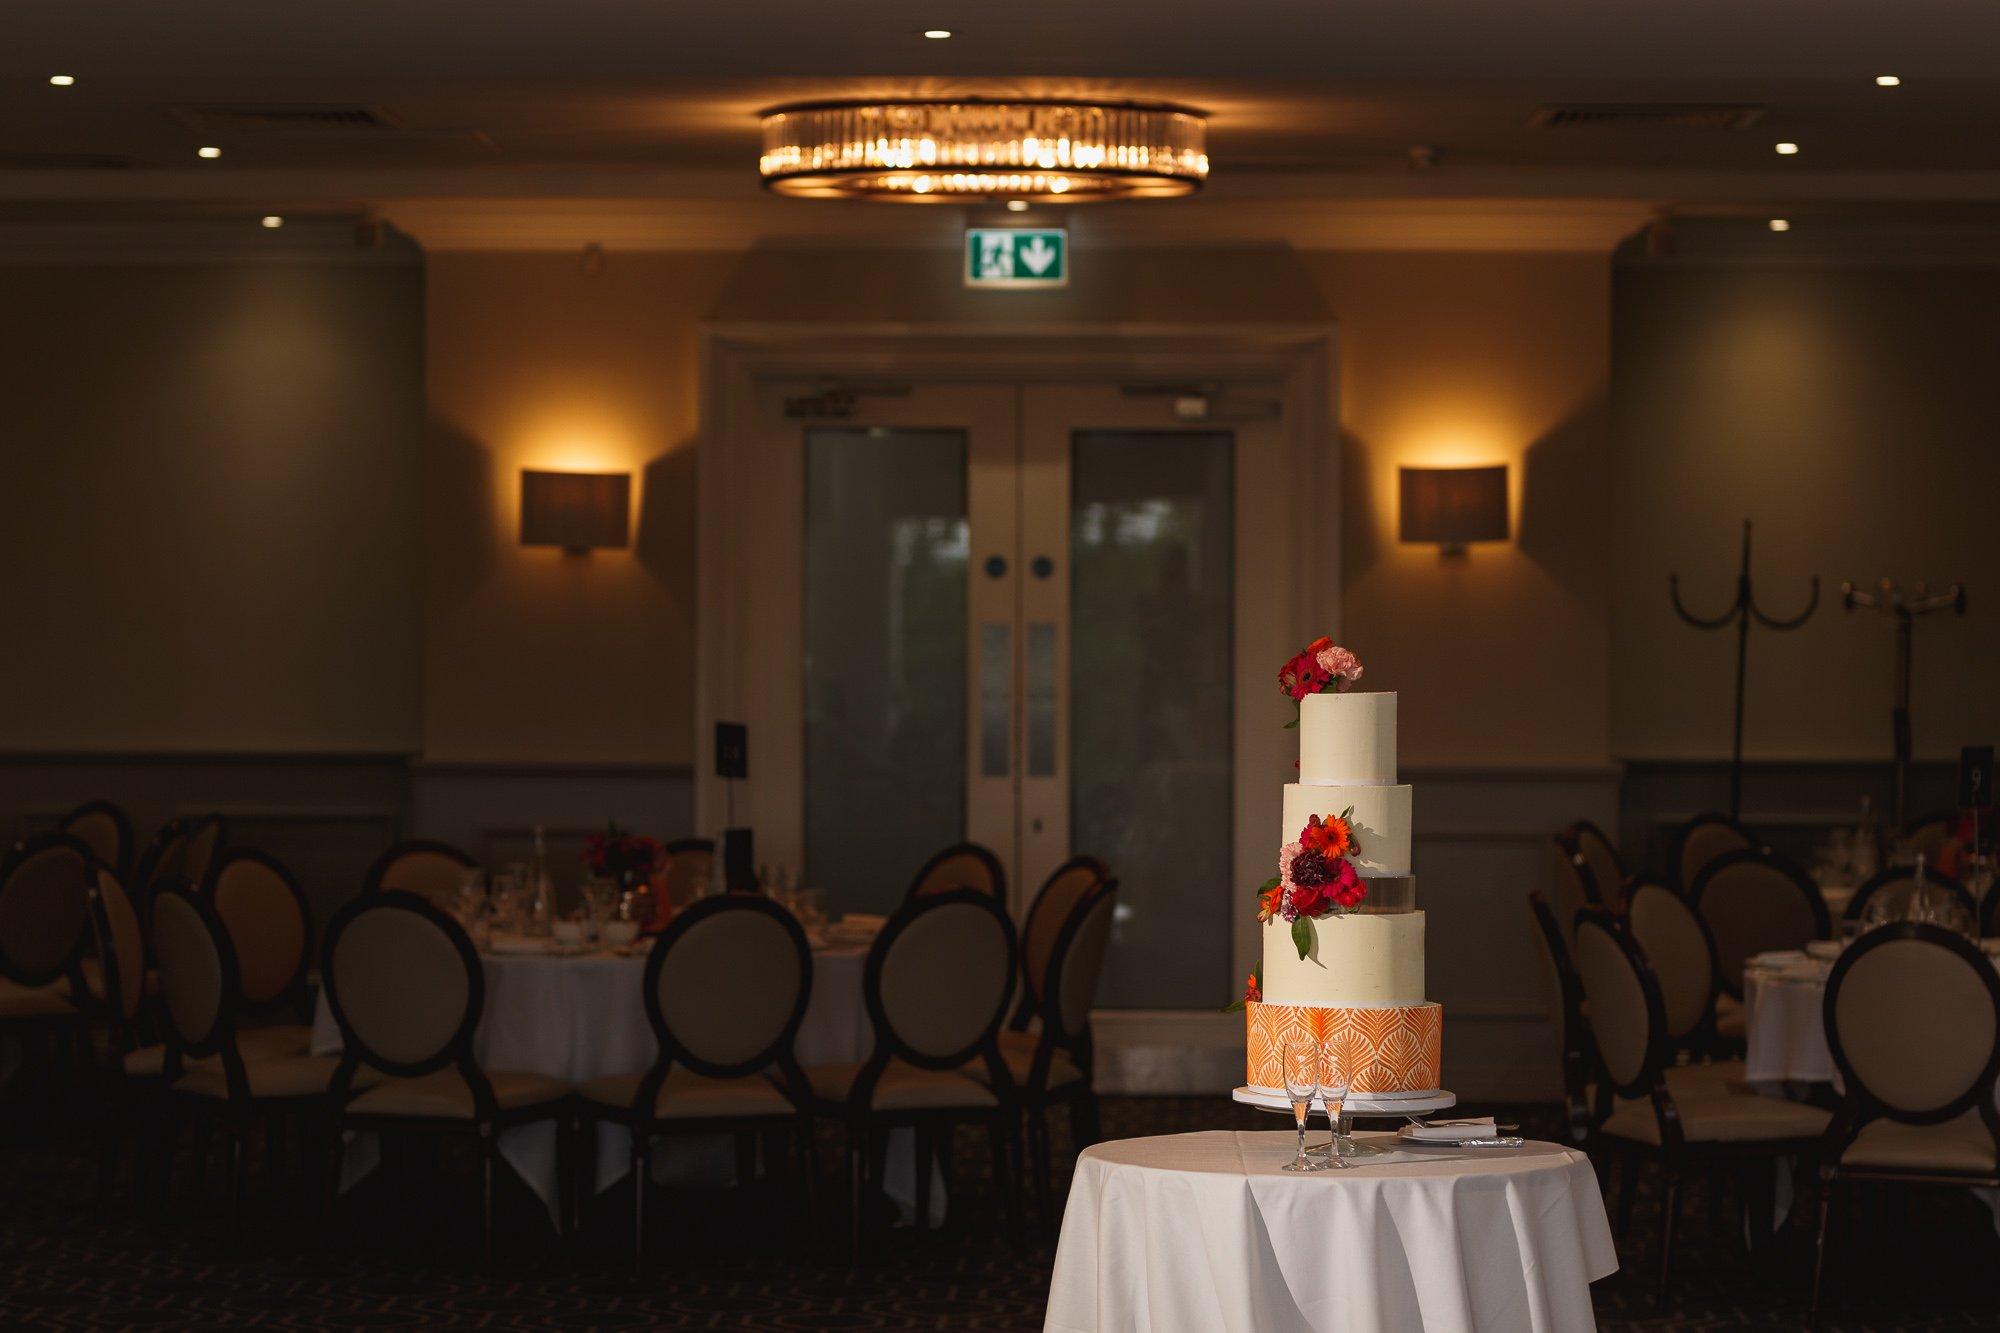 De Vere Wokefield Estate, Asian wedding photographer, reception, wedding cake, Paari Cakes